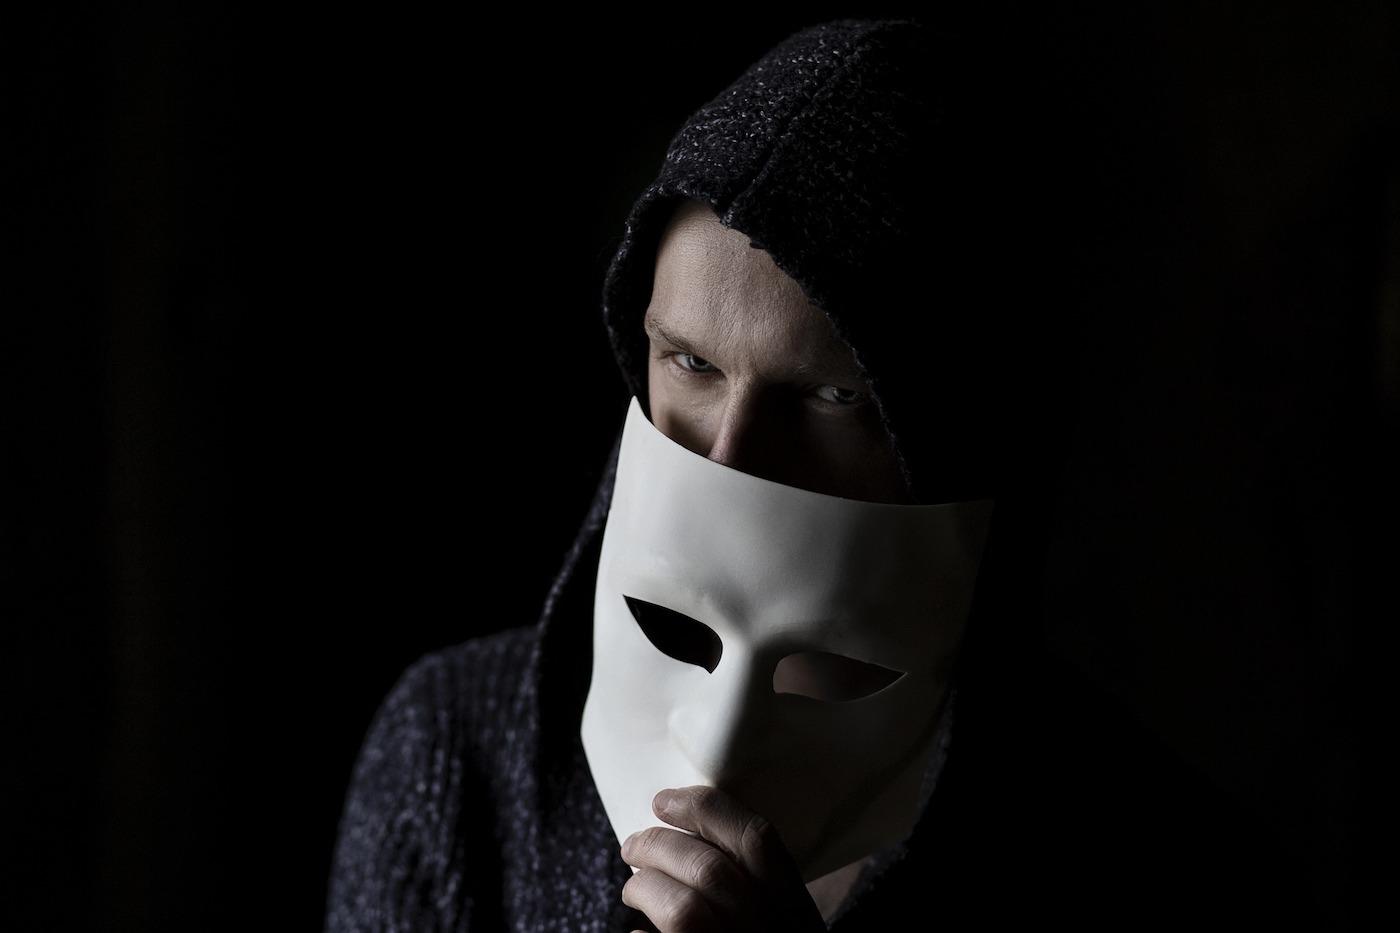 podvody a scam